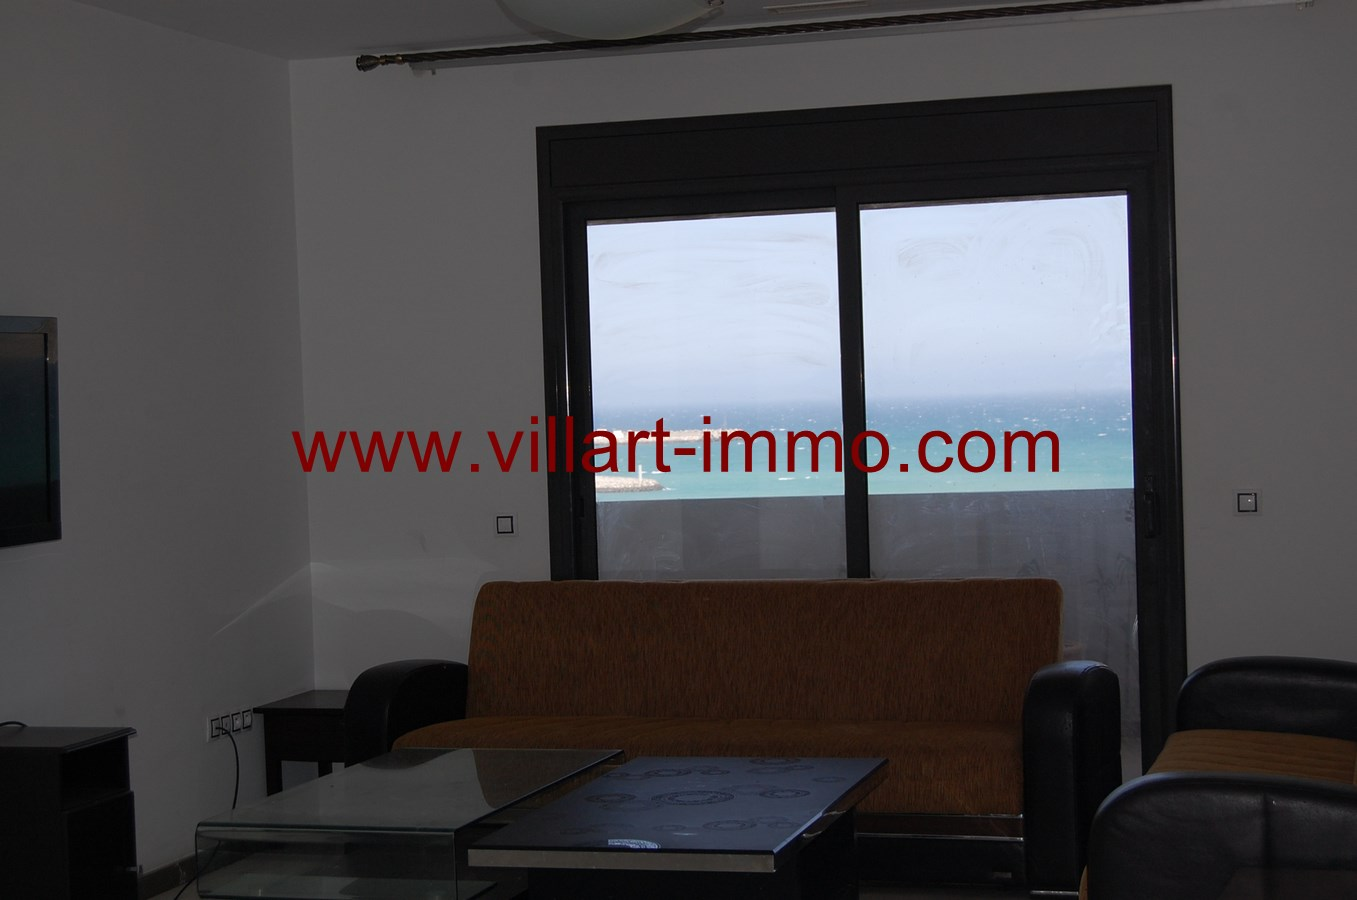 1-a-vendre-appartement-tanger-quartier-playa-salon-va432-villart-immo